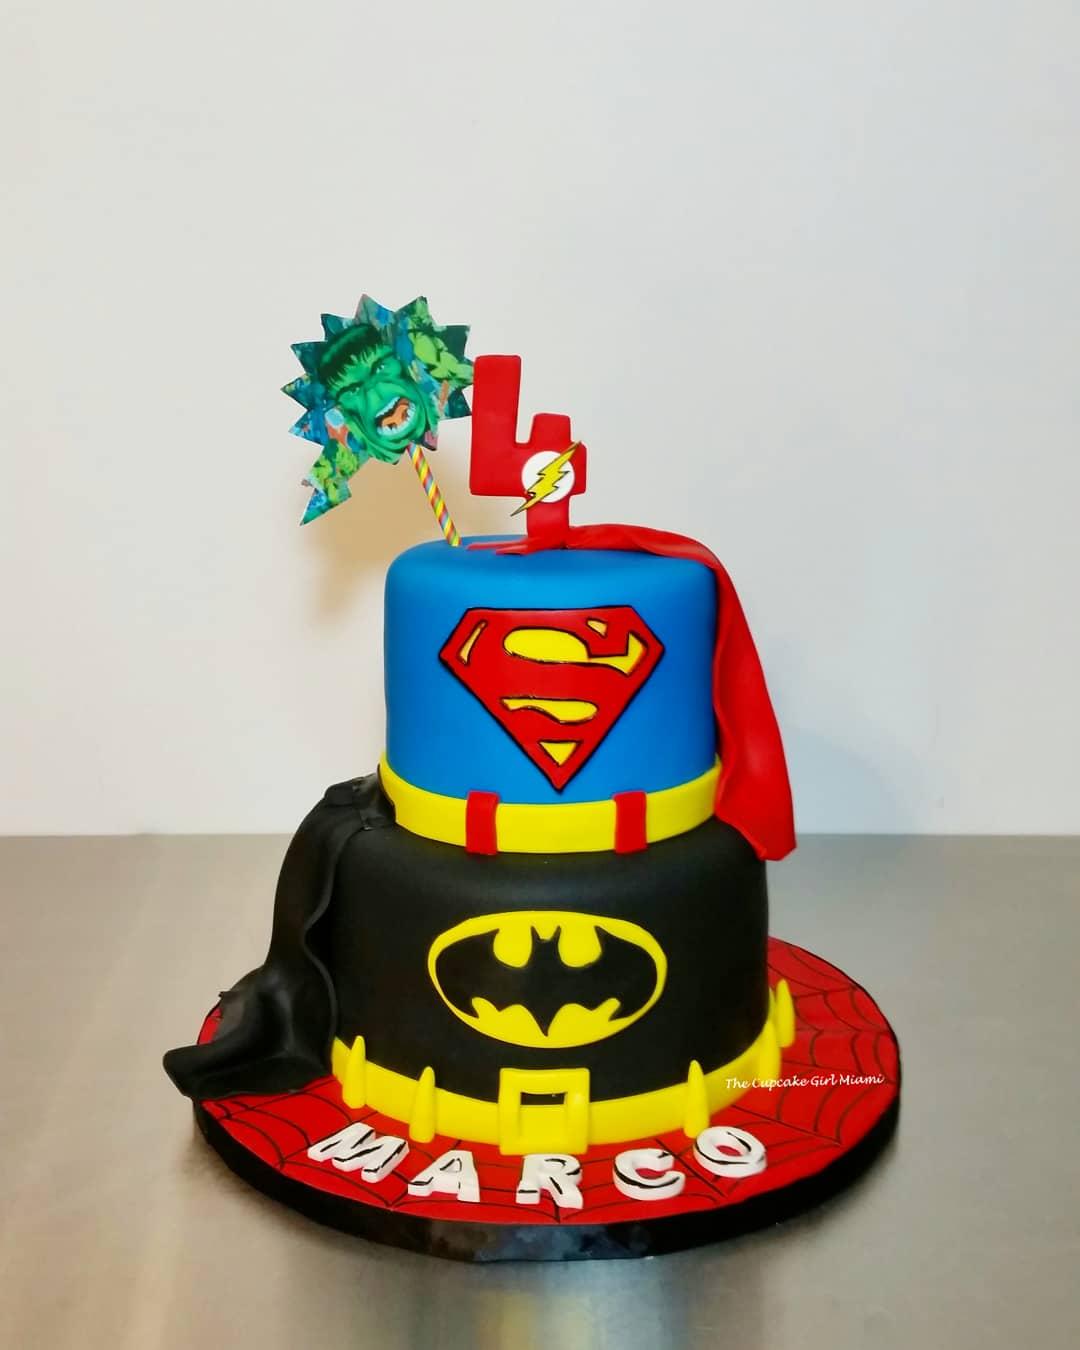 Incredible Birthday Cakes Wedding Cakes Baby Shower Cakes The Cupcake Funny Birthday Cards Online Elaedamsfinfo